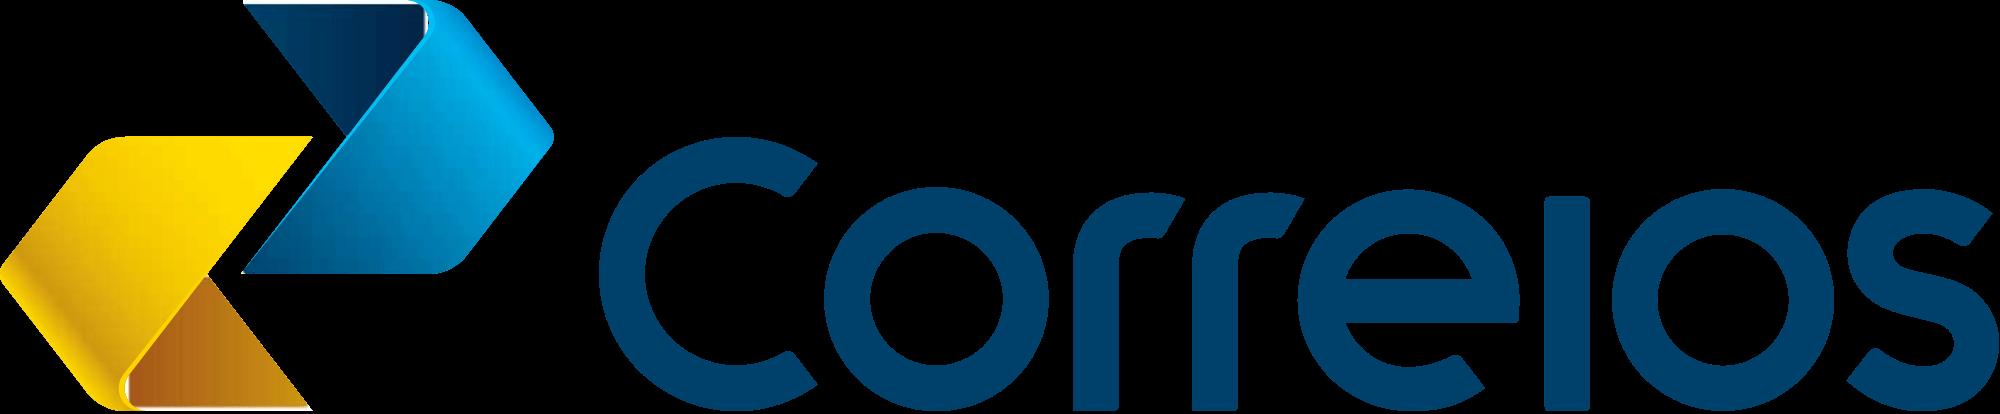 logotipo pac